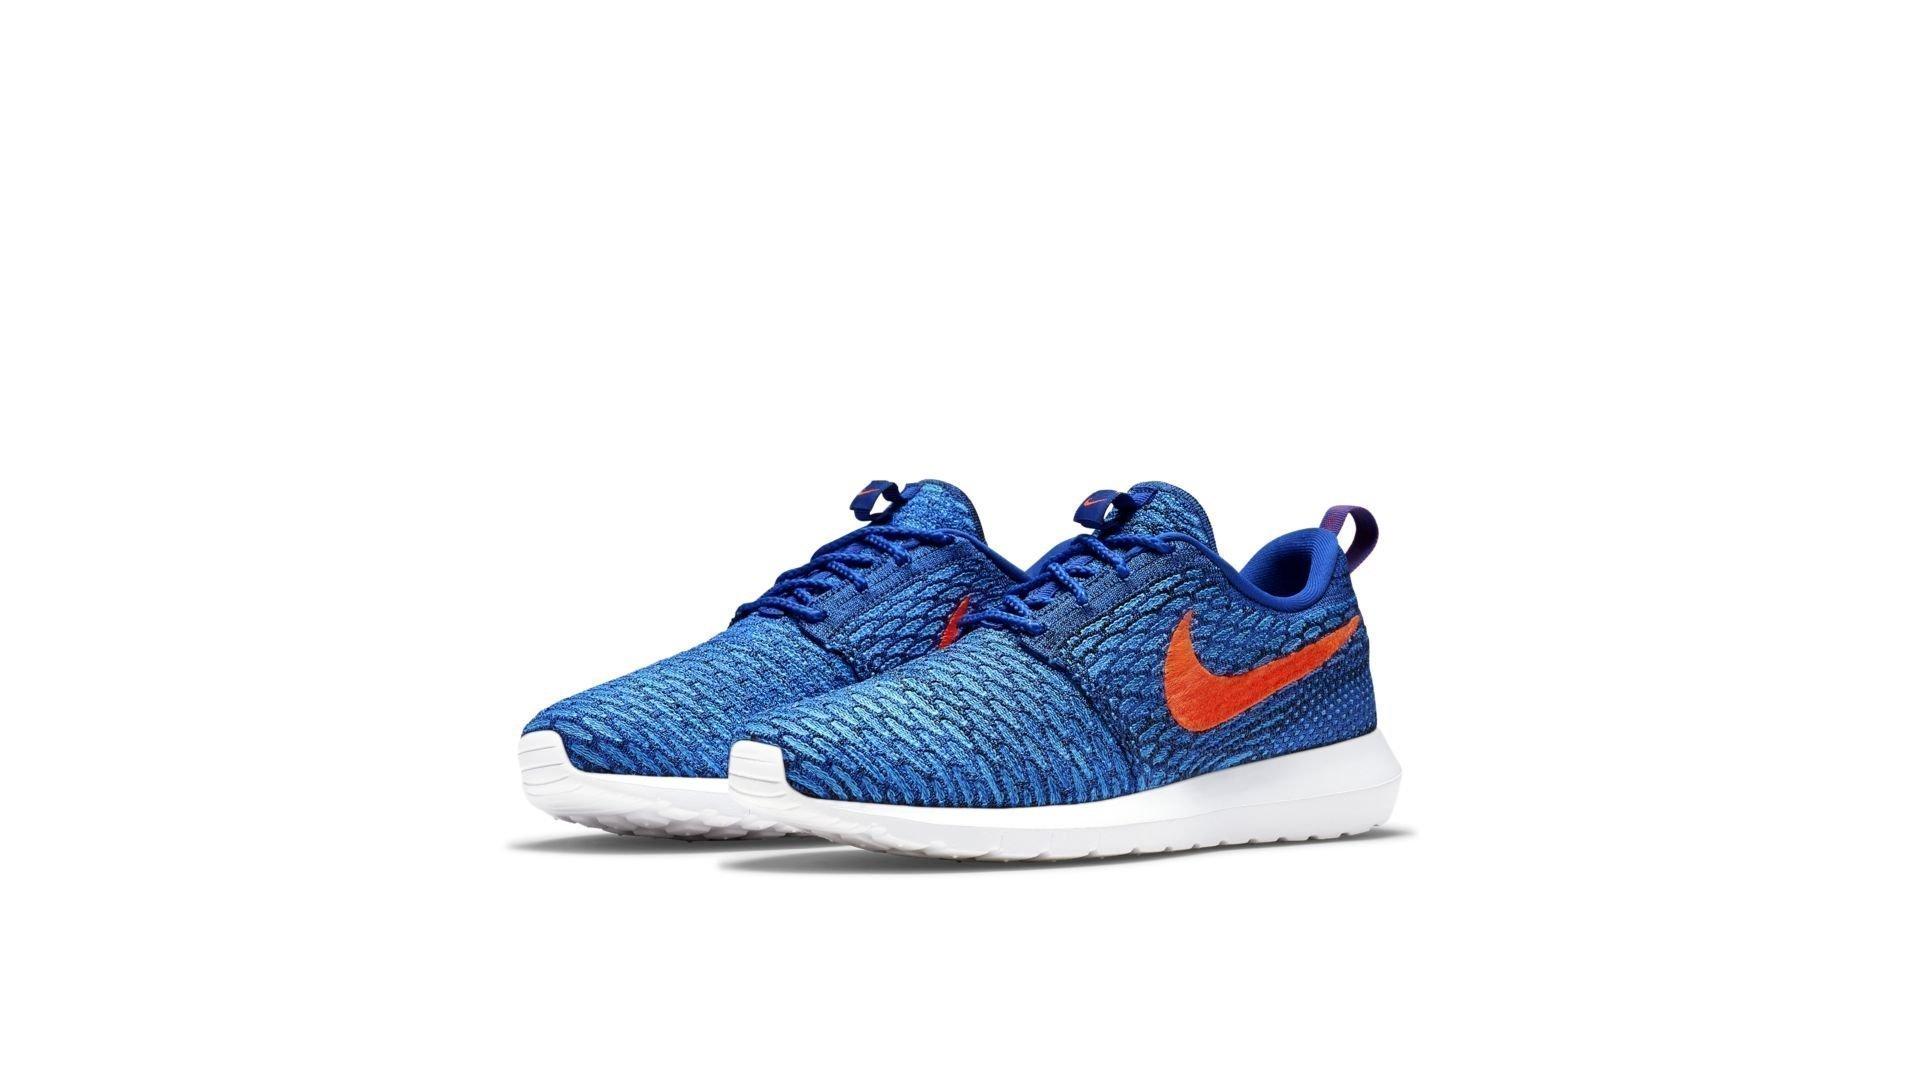 Nike Roshe Run Flyknit Game Royal Bright Crimson (677243-401)